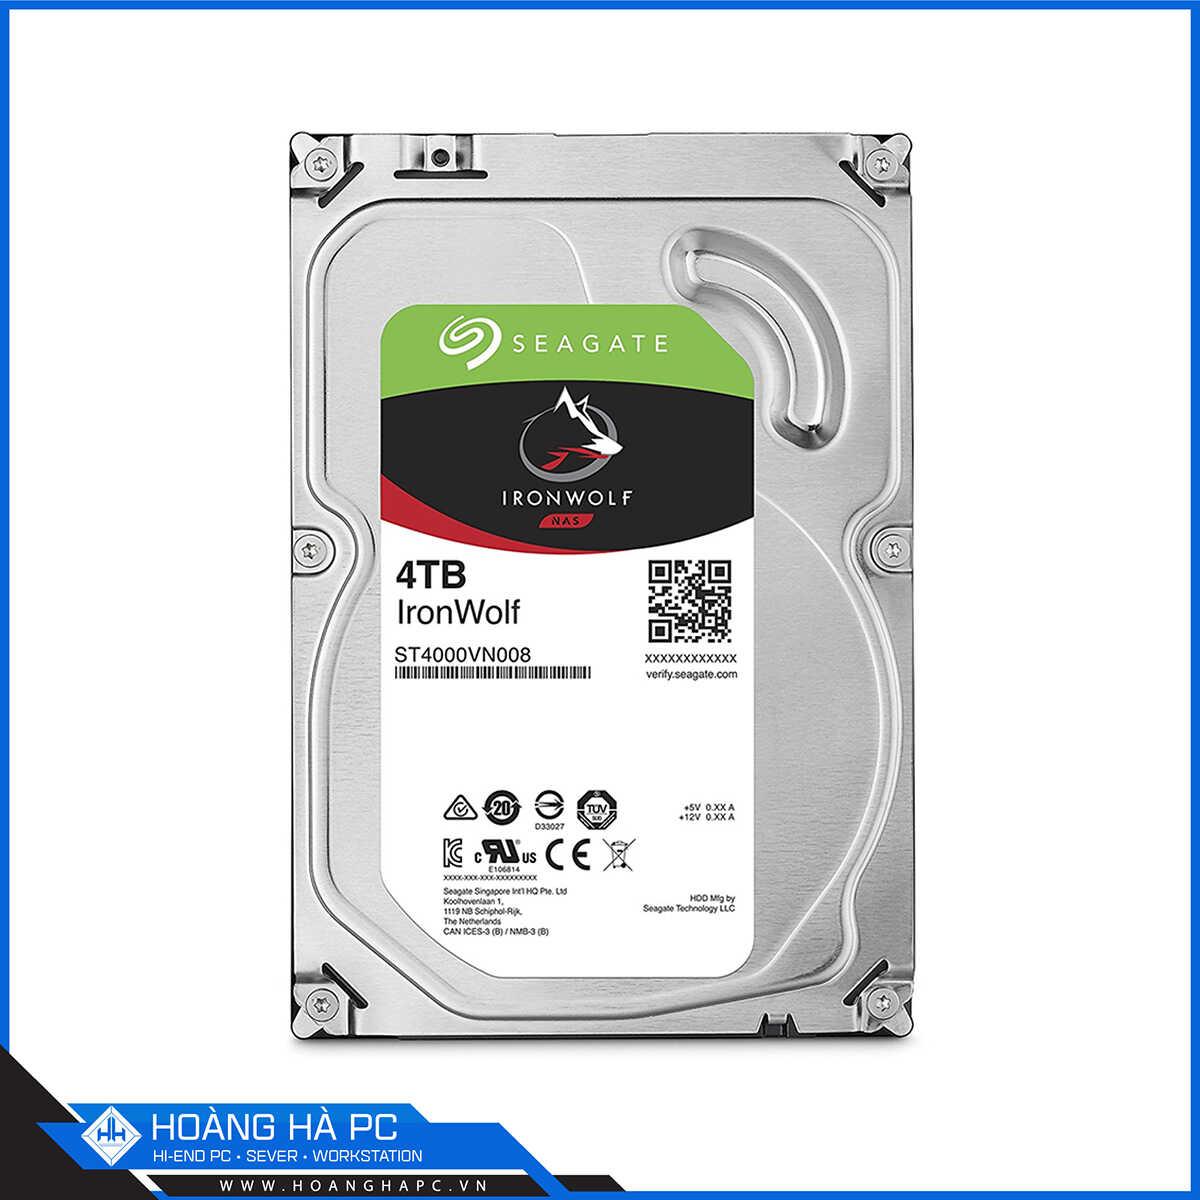 Ổ cứng HDD Seagate Ironwolf 4TB